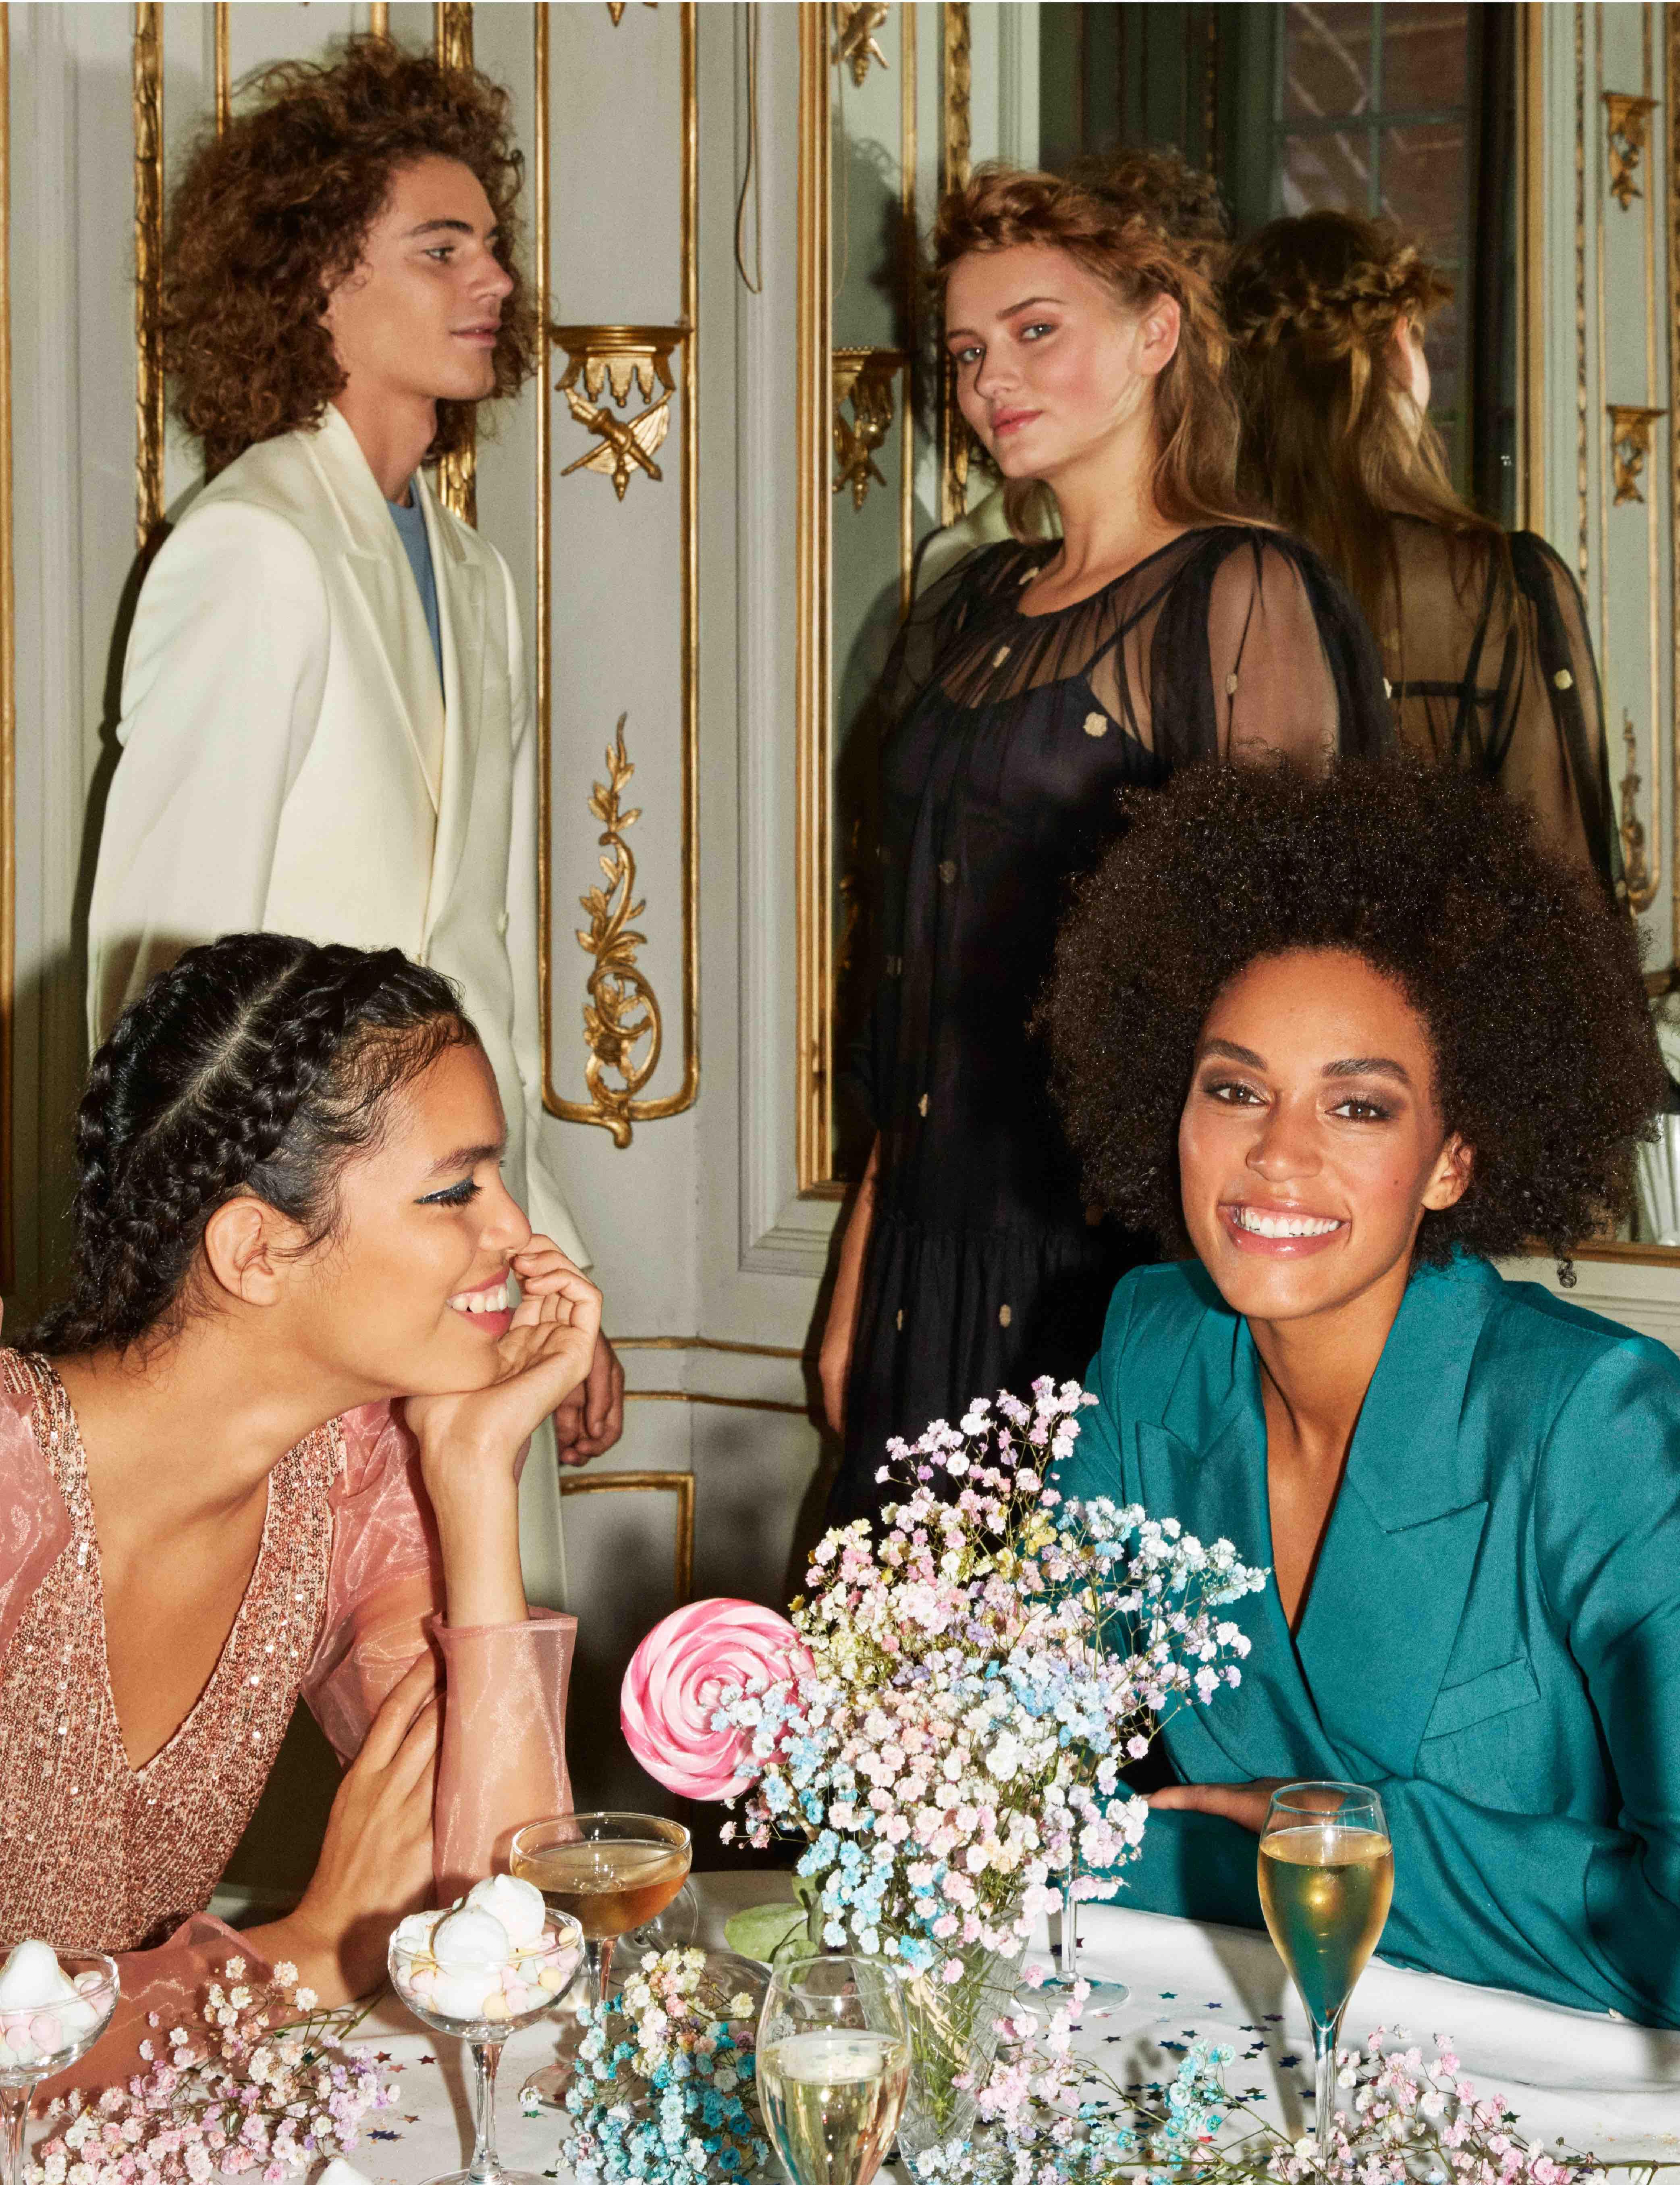 (P) Maria Nila iti prezinta idei pentru styling-uri superbe de sarbatori